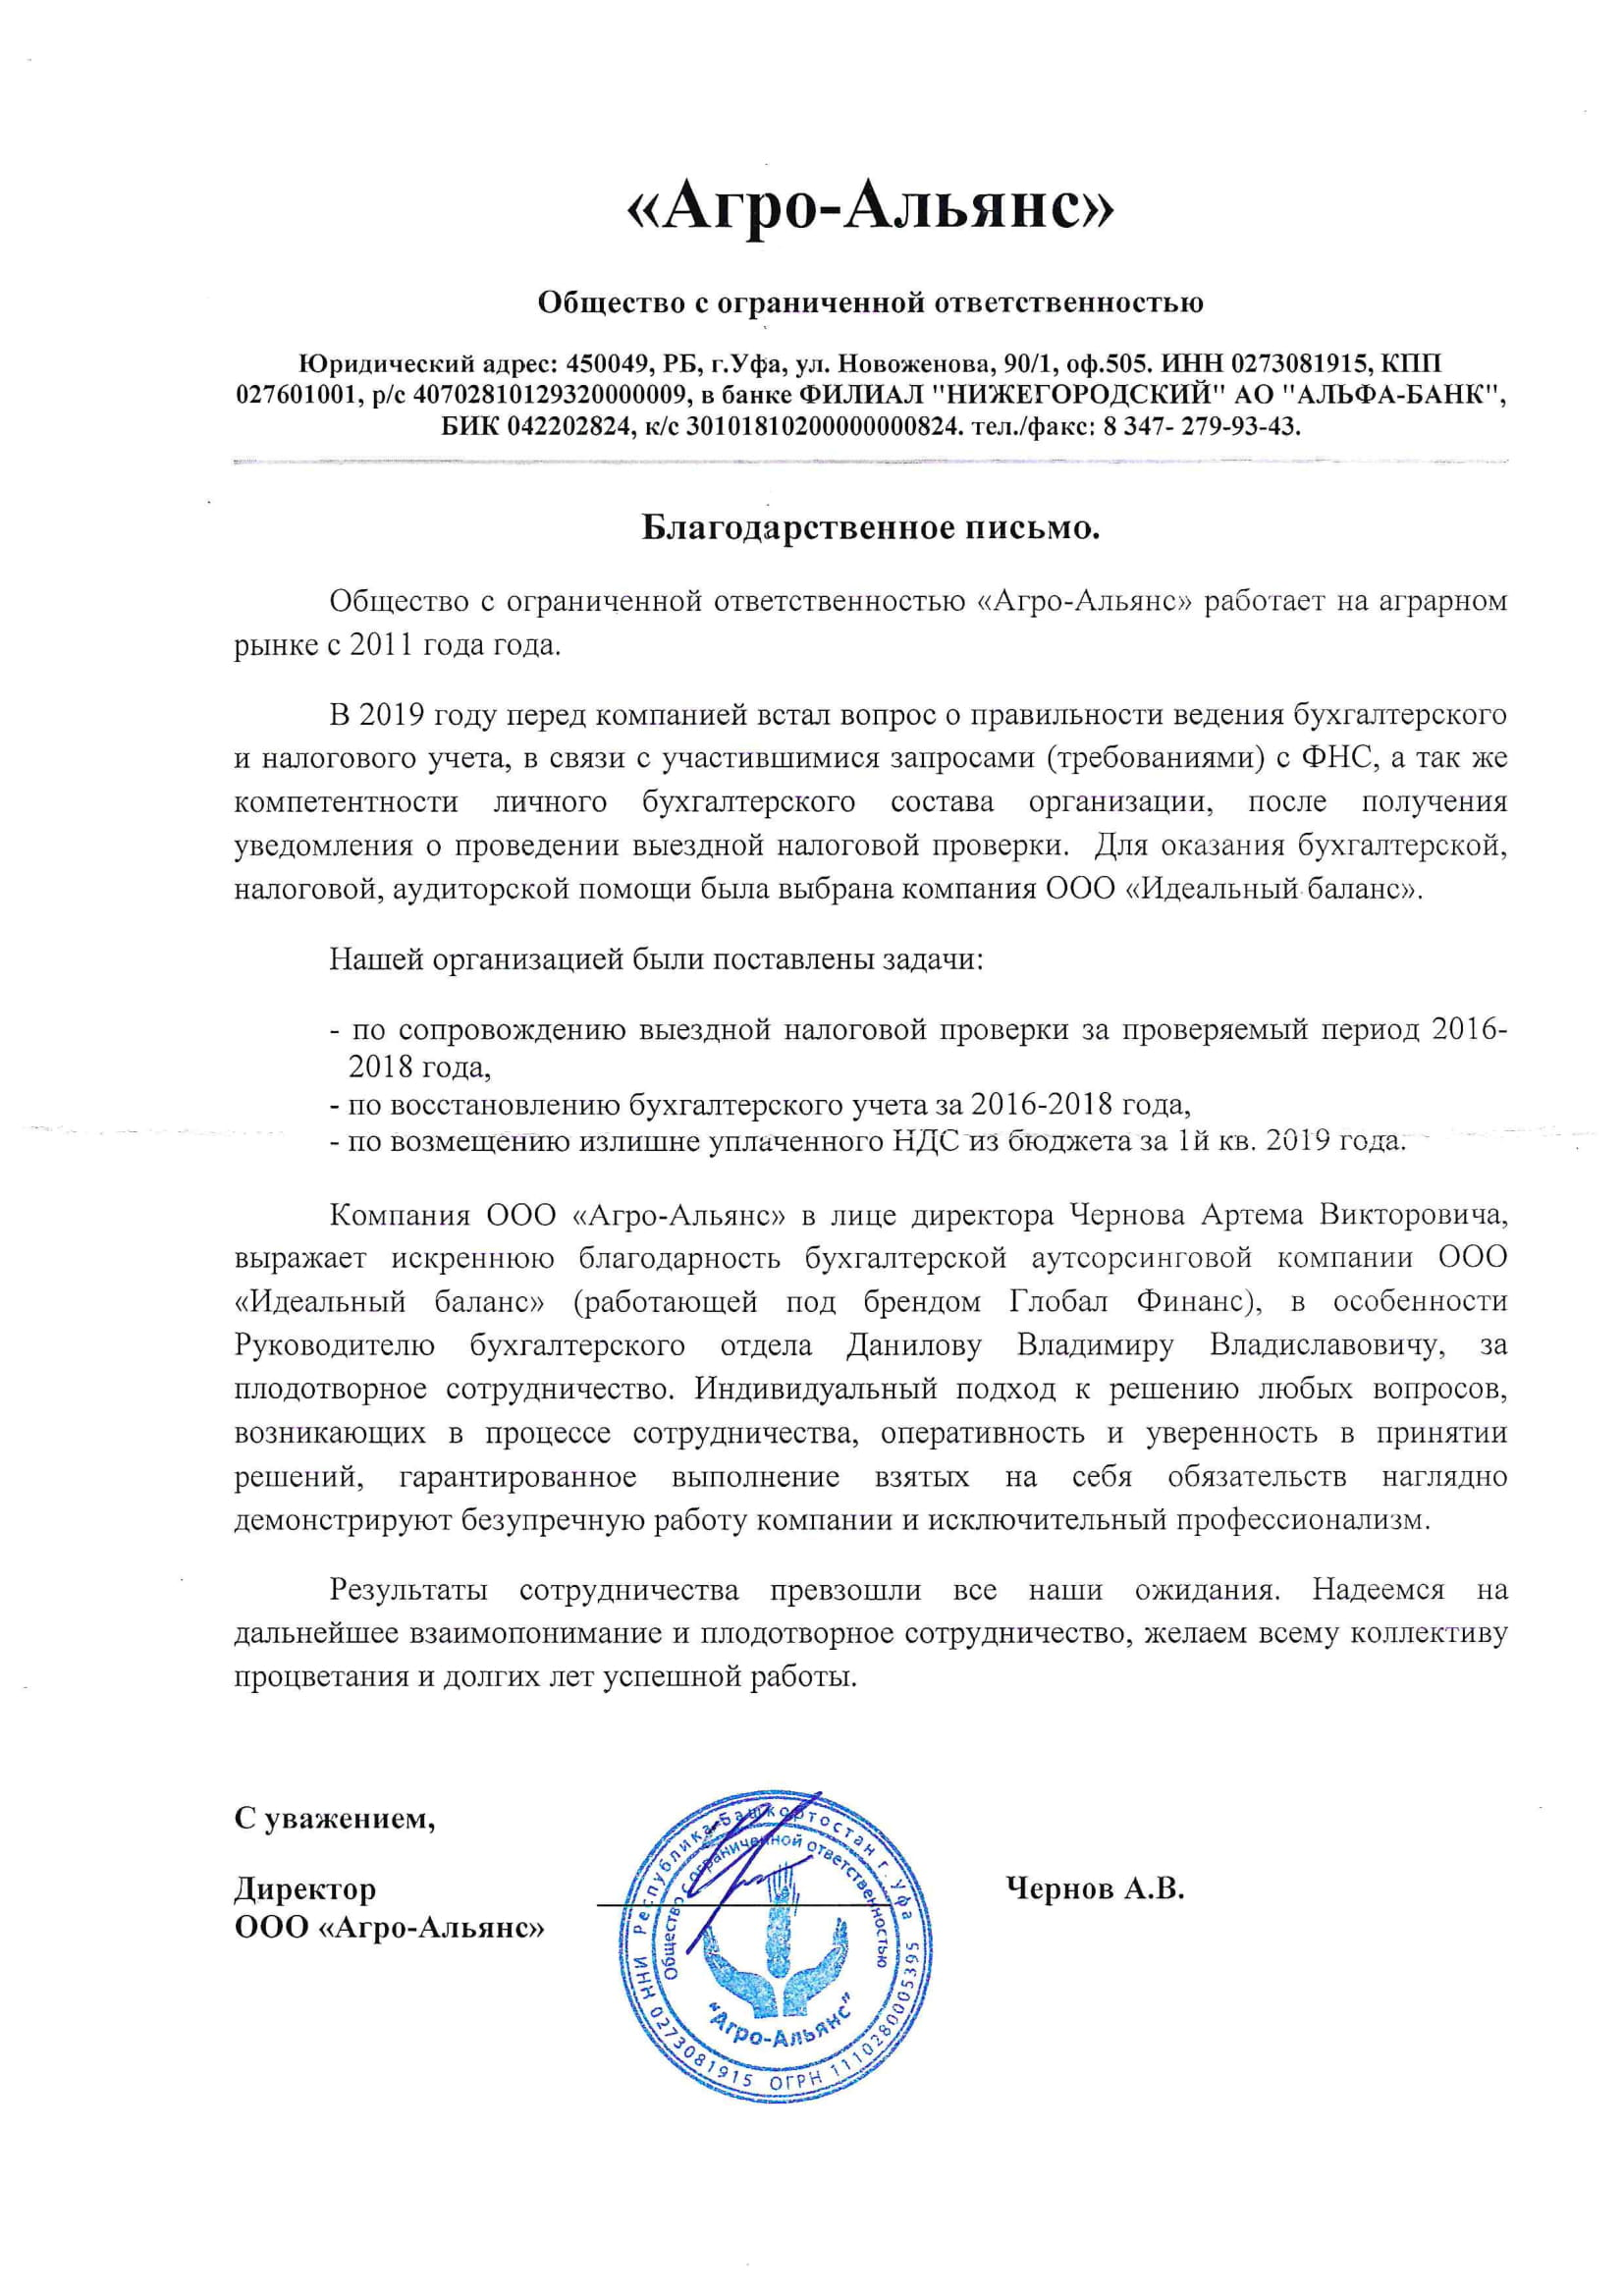 ООО «Агро-Альянс»